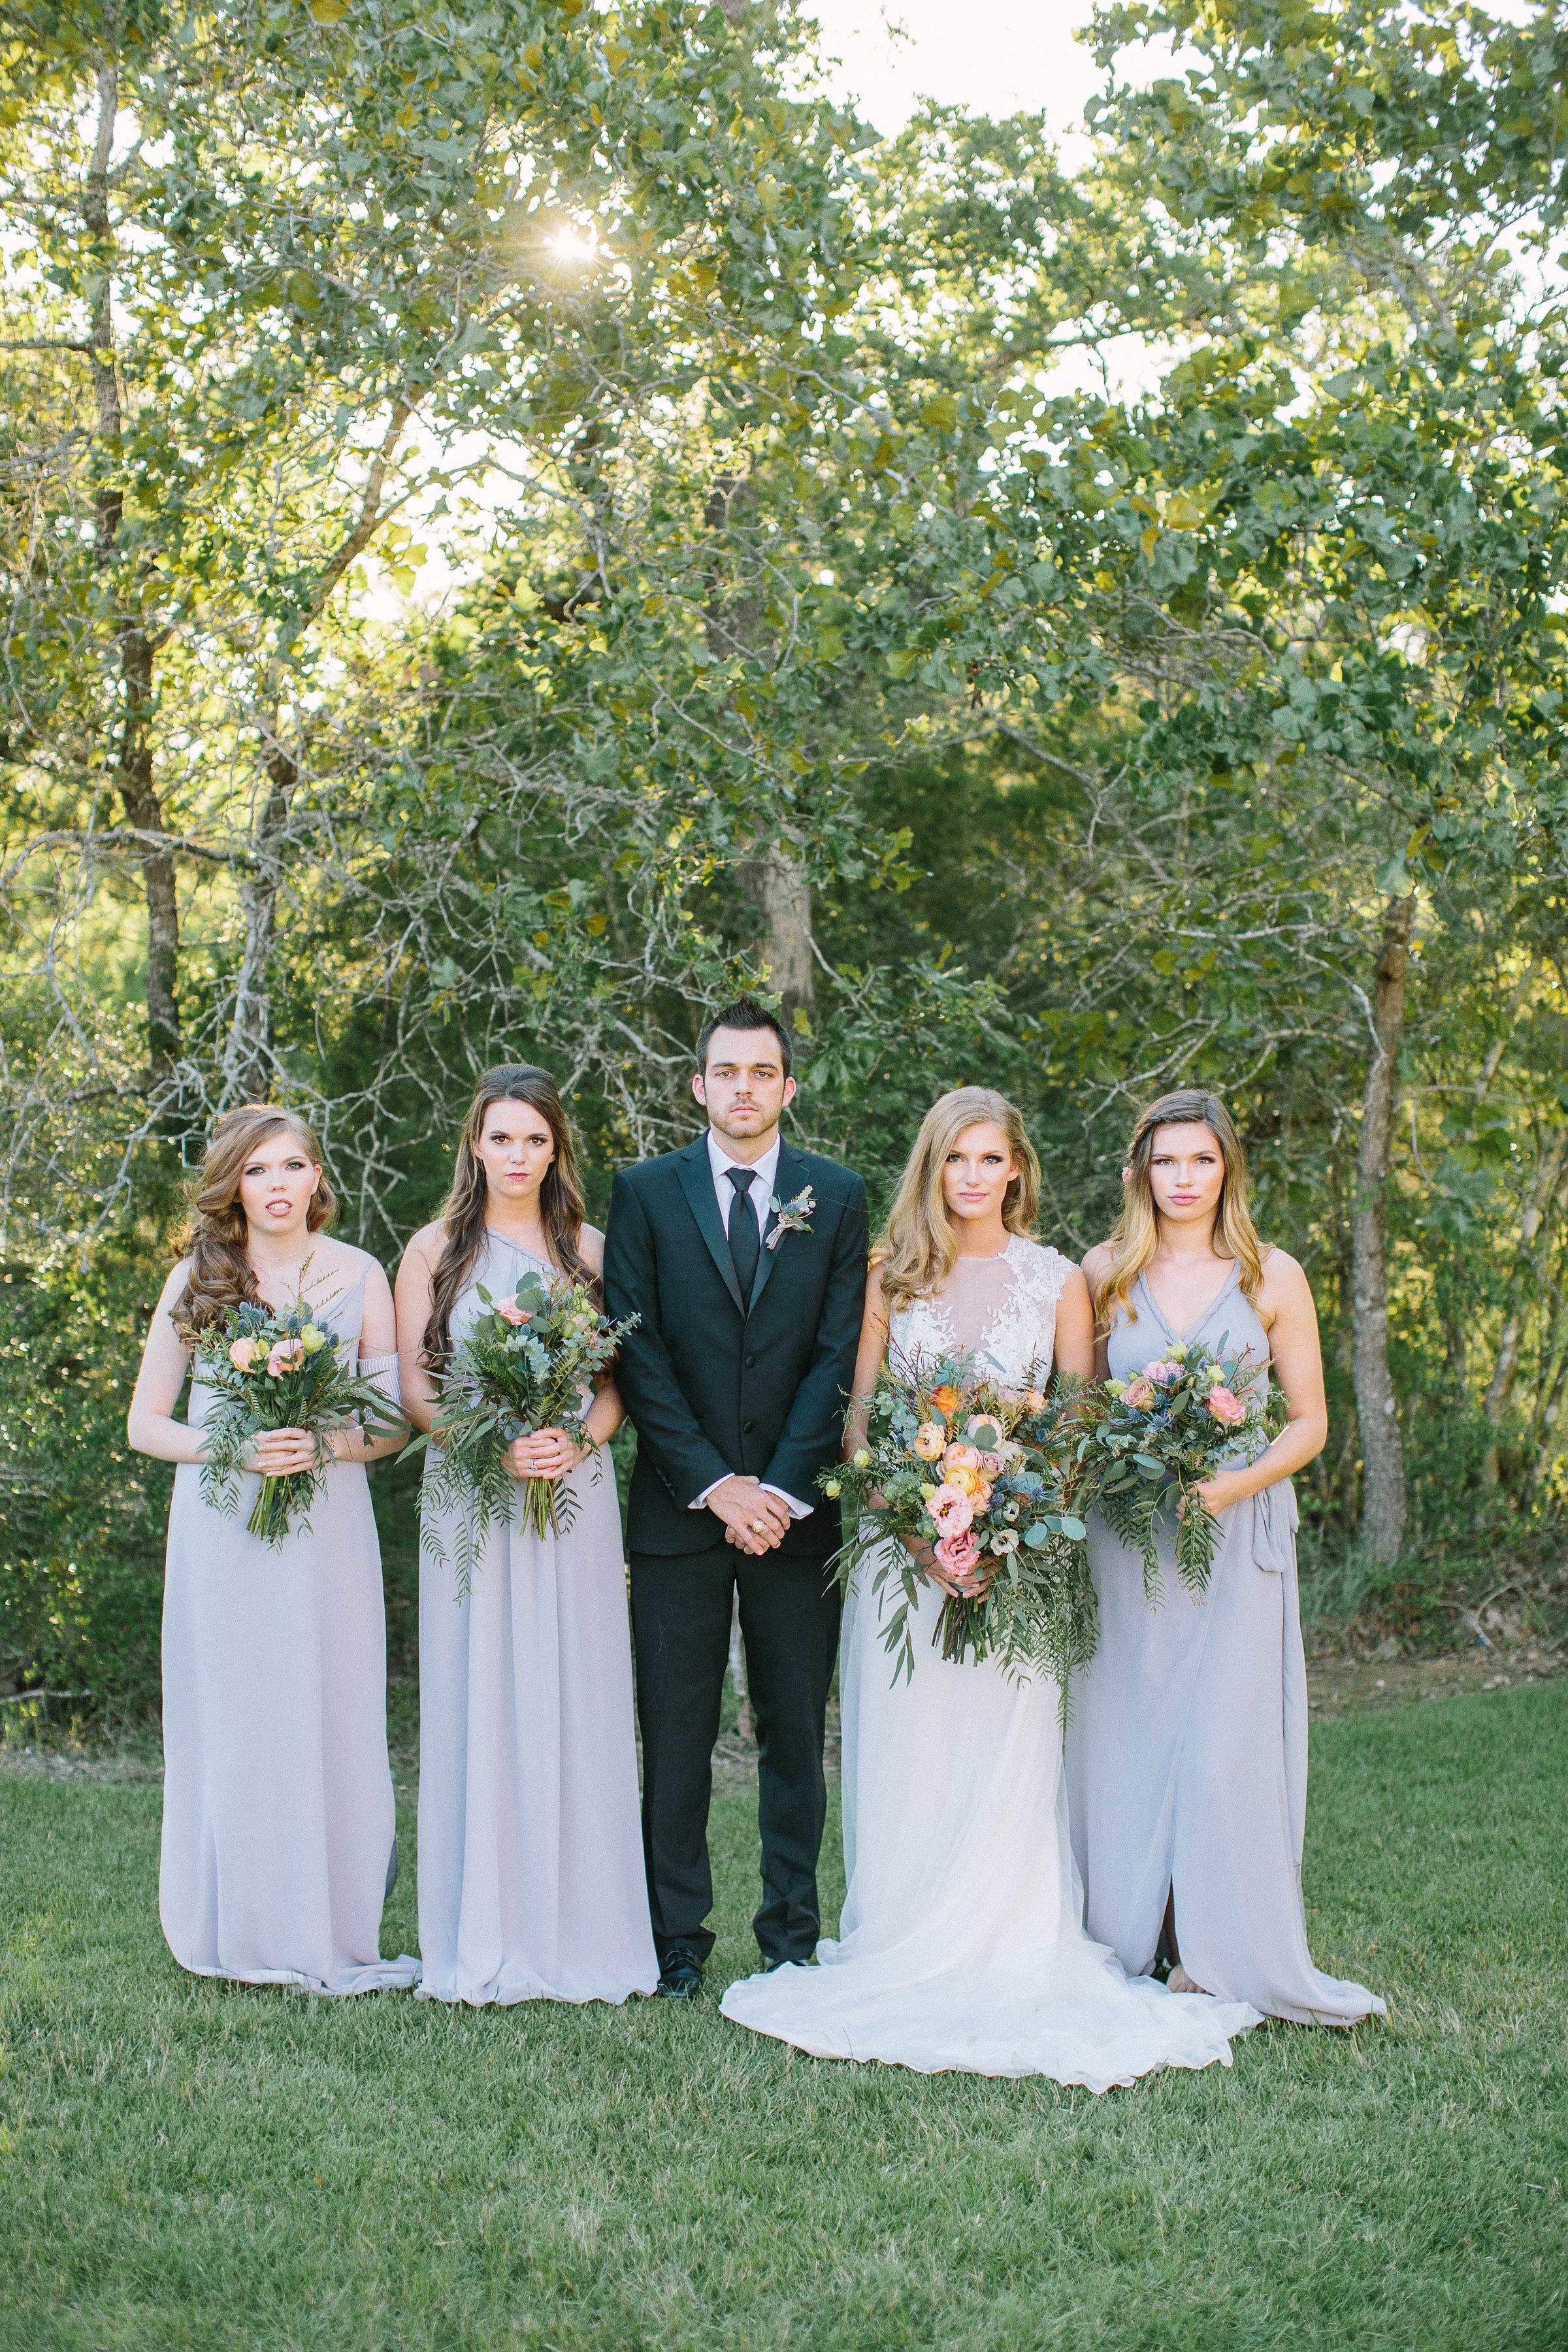 Ellen-Ashton-Photography-Peach-Creek-Ranch-Weddings-Wed-and-Prosper246